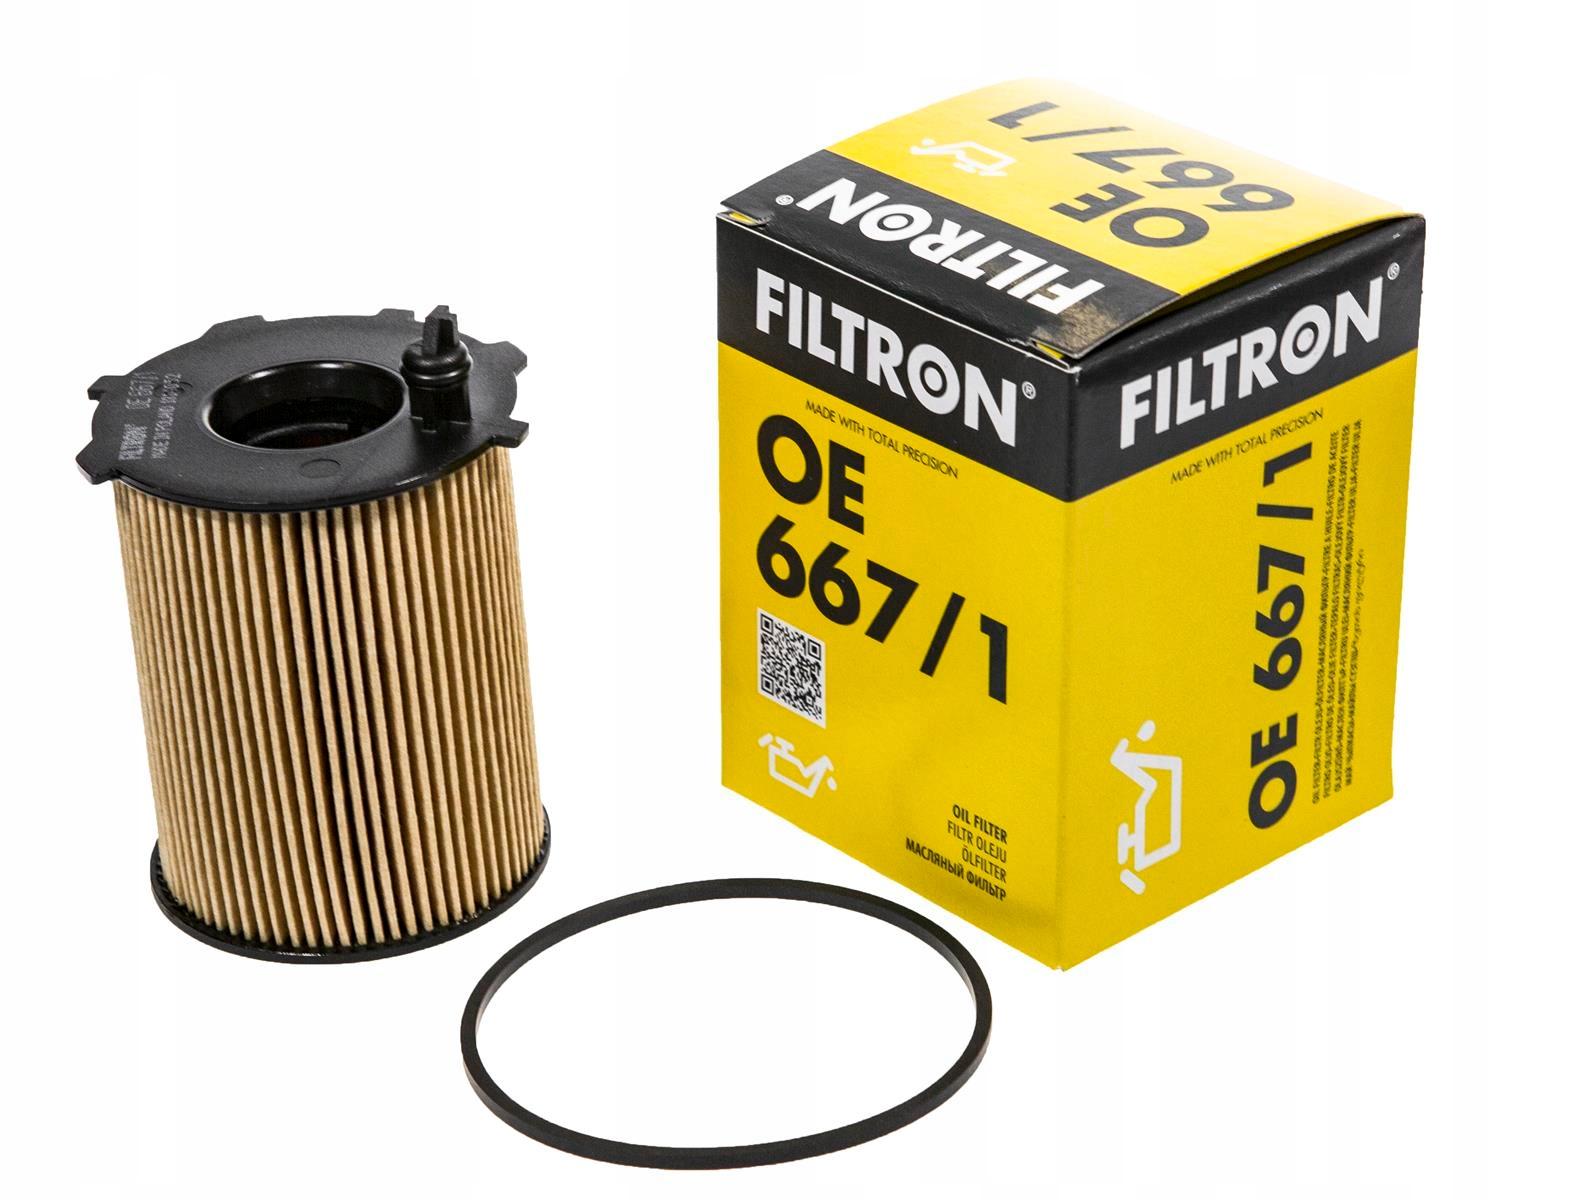 фильтр масла filtron oe 6671